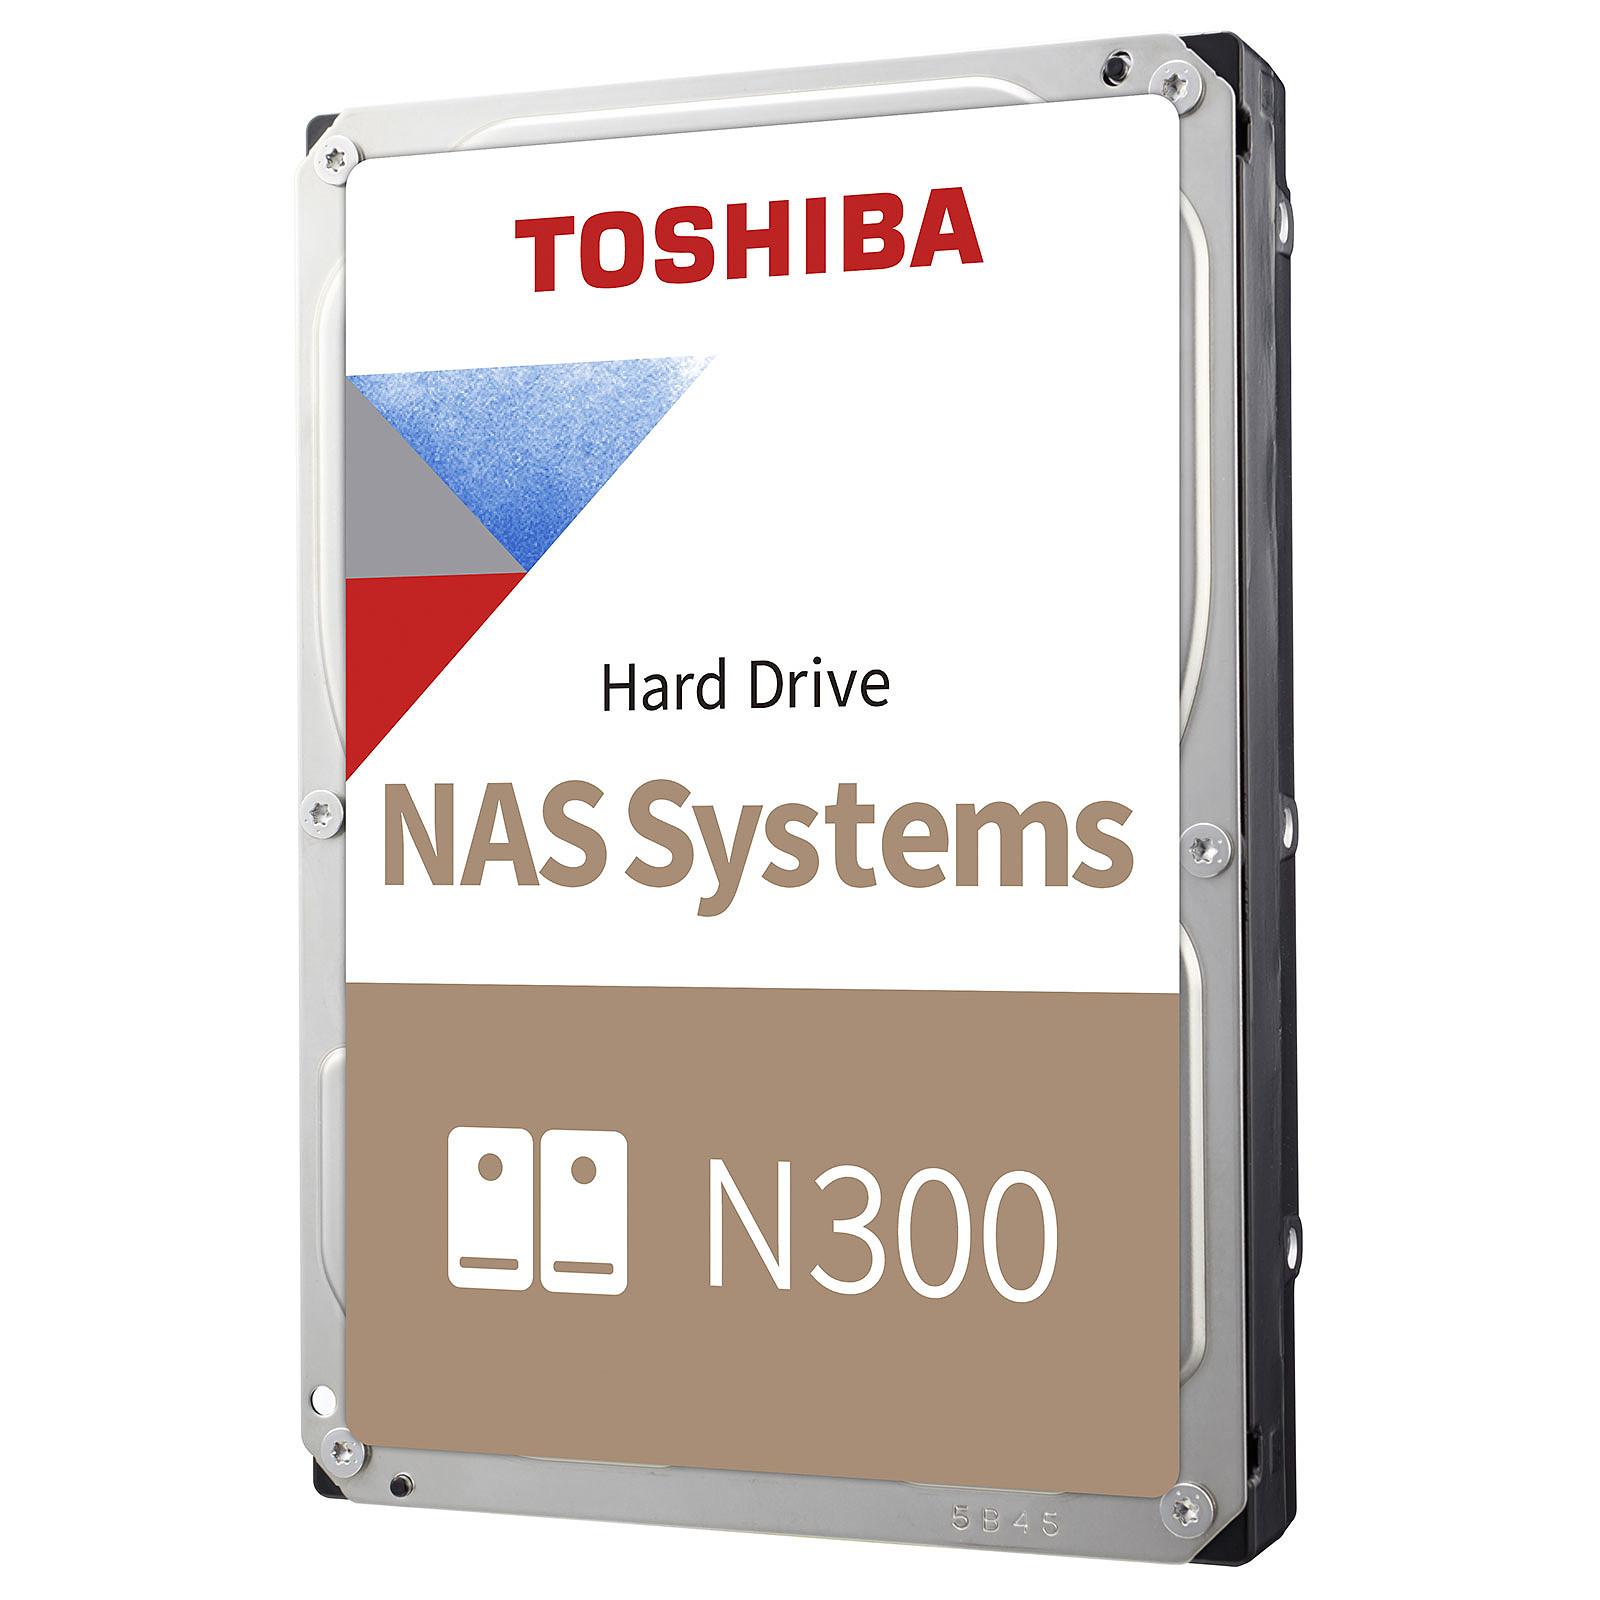 Toshiba N300 14 To